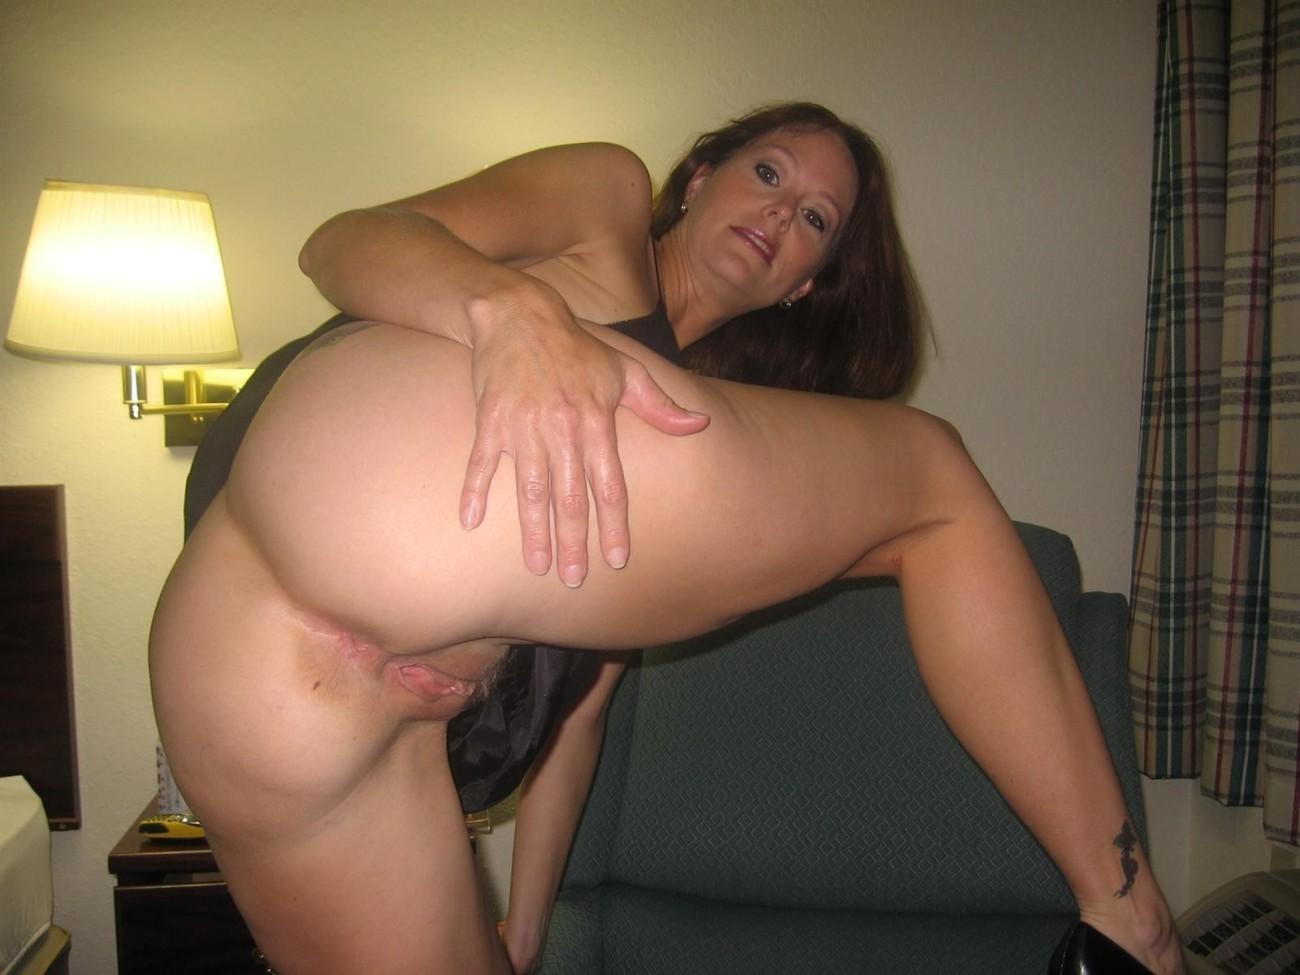 Mature Blonde Porn Jpg